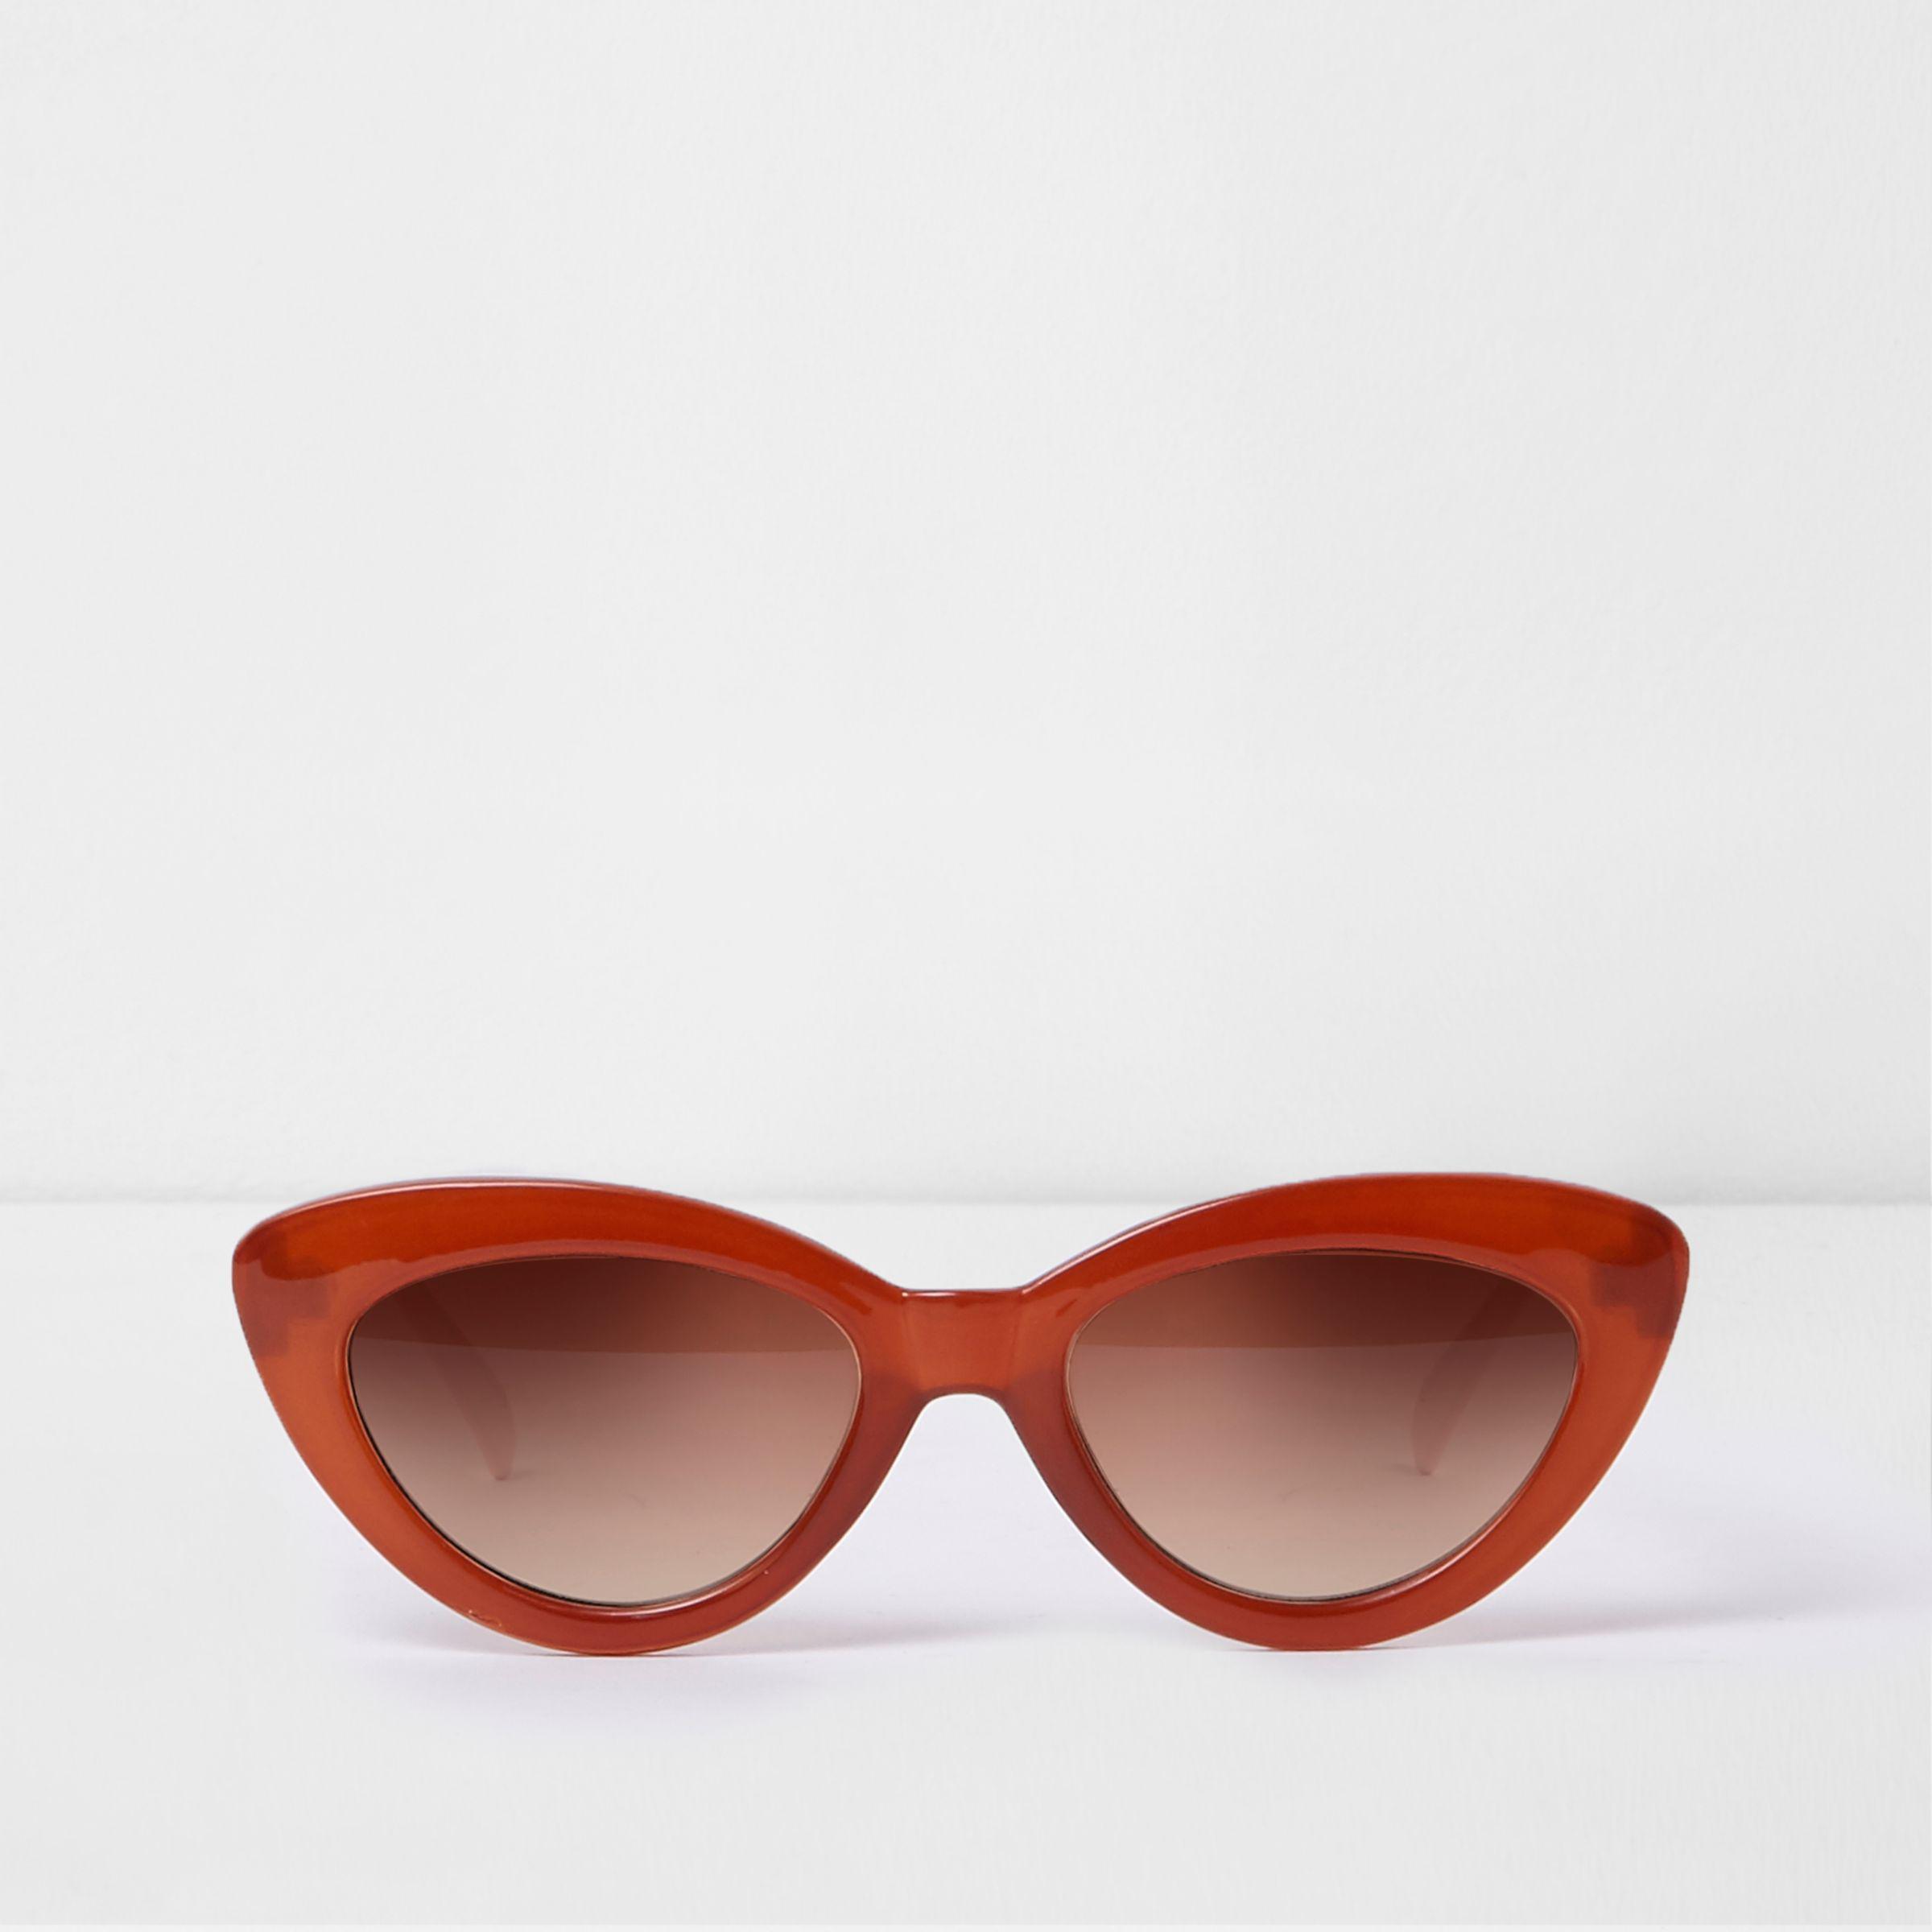 5851f93e8bc1 Lyst - River Island Dark Cat Eye Tinted Lens Sunglasses in Orange